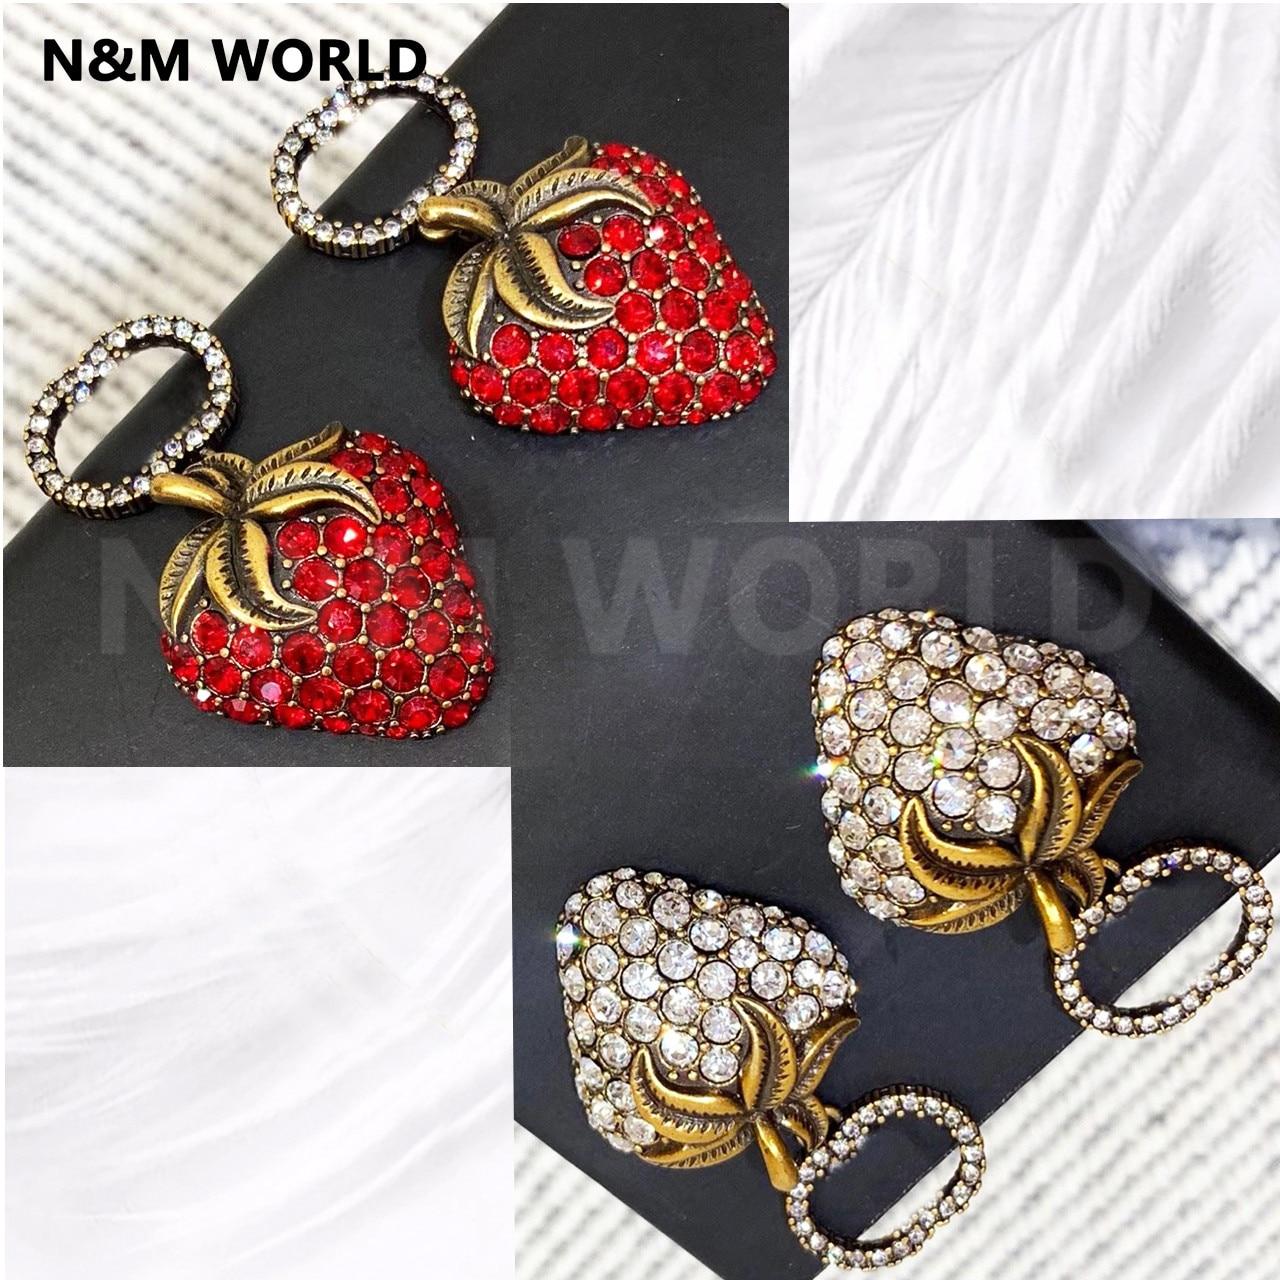 Women Girl Fashion Jewelry New 2019 Cute Strawberry Jewelry Earrings Christmas Party Earing Dangle Earring